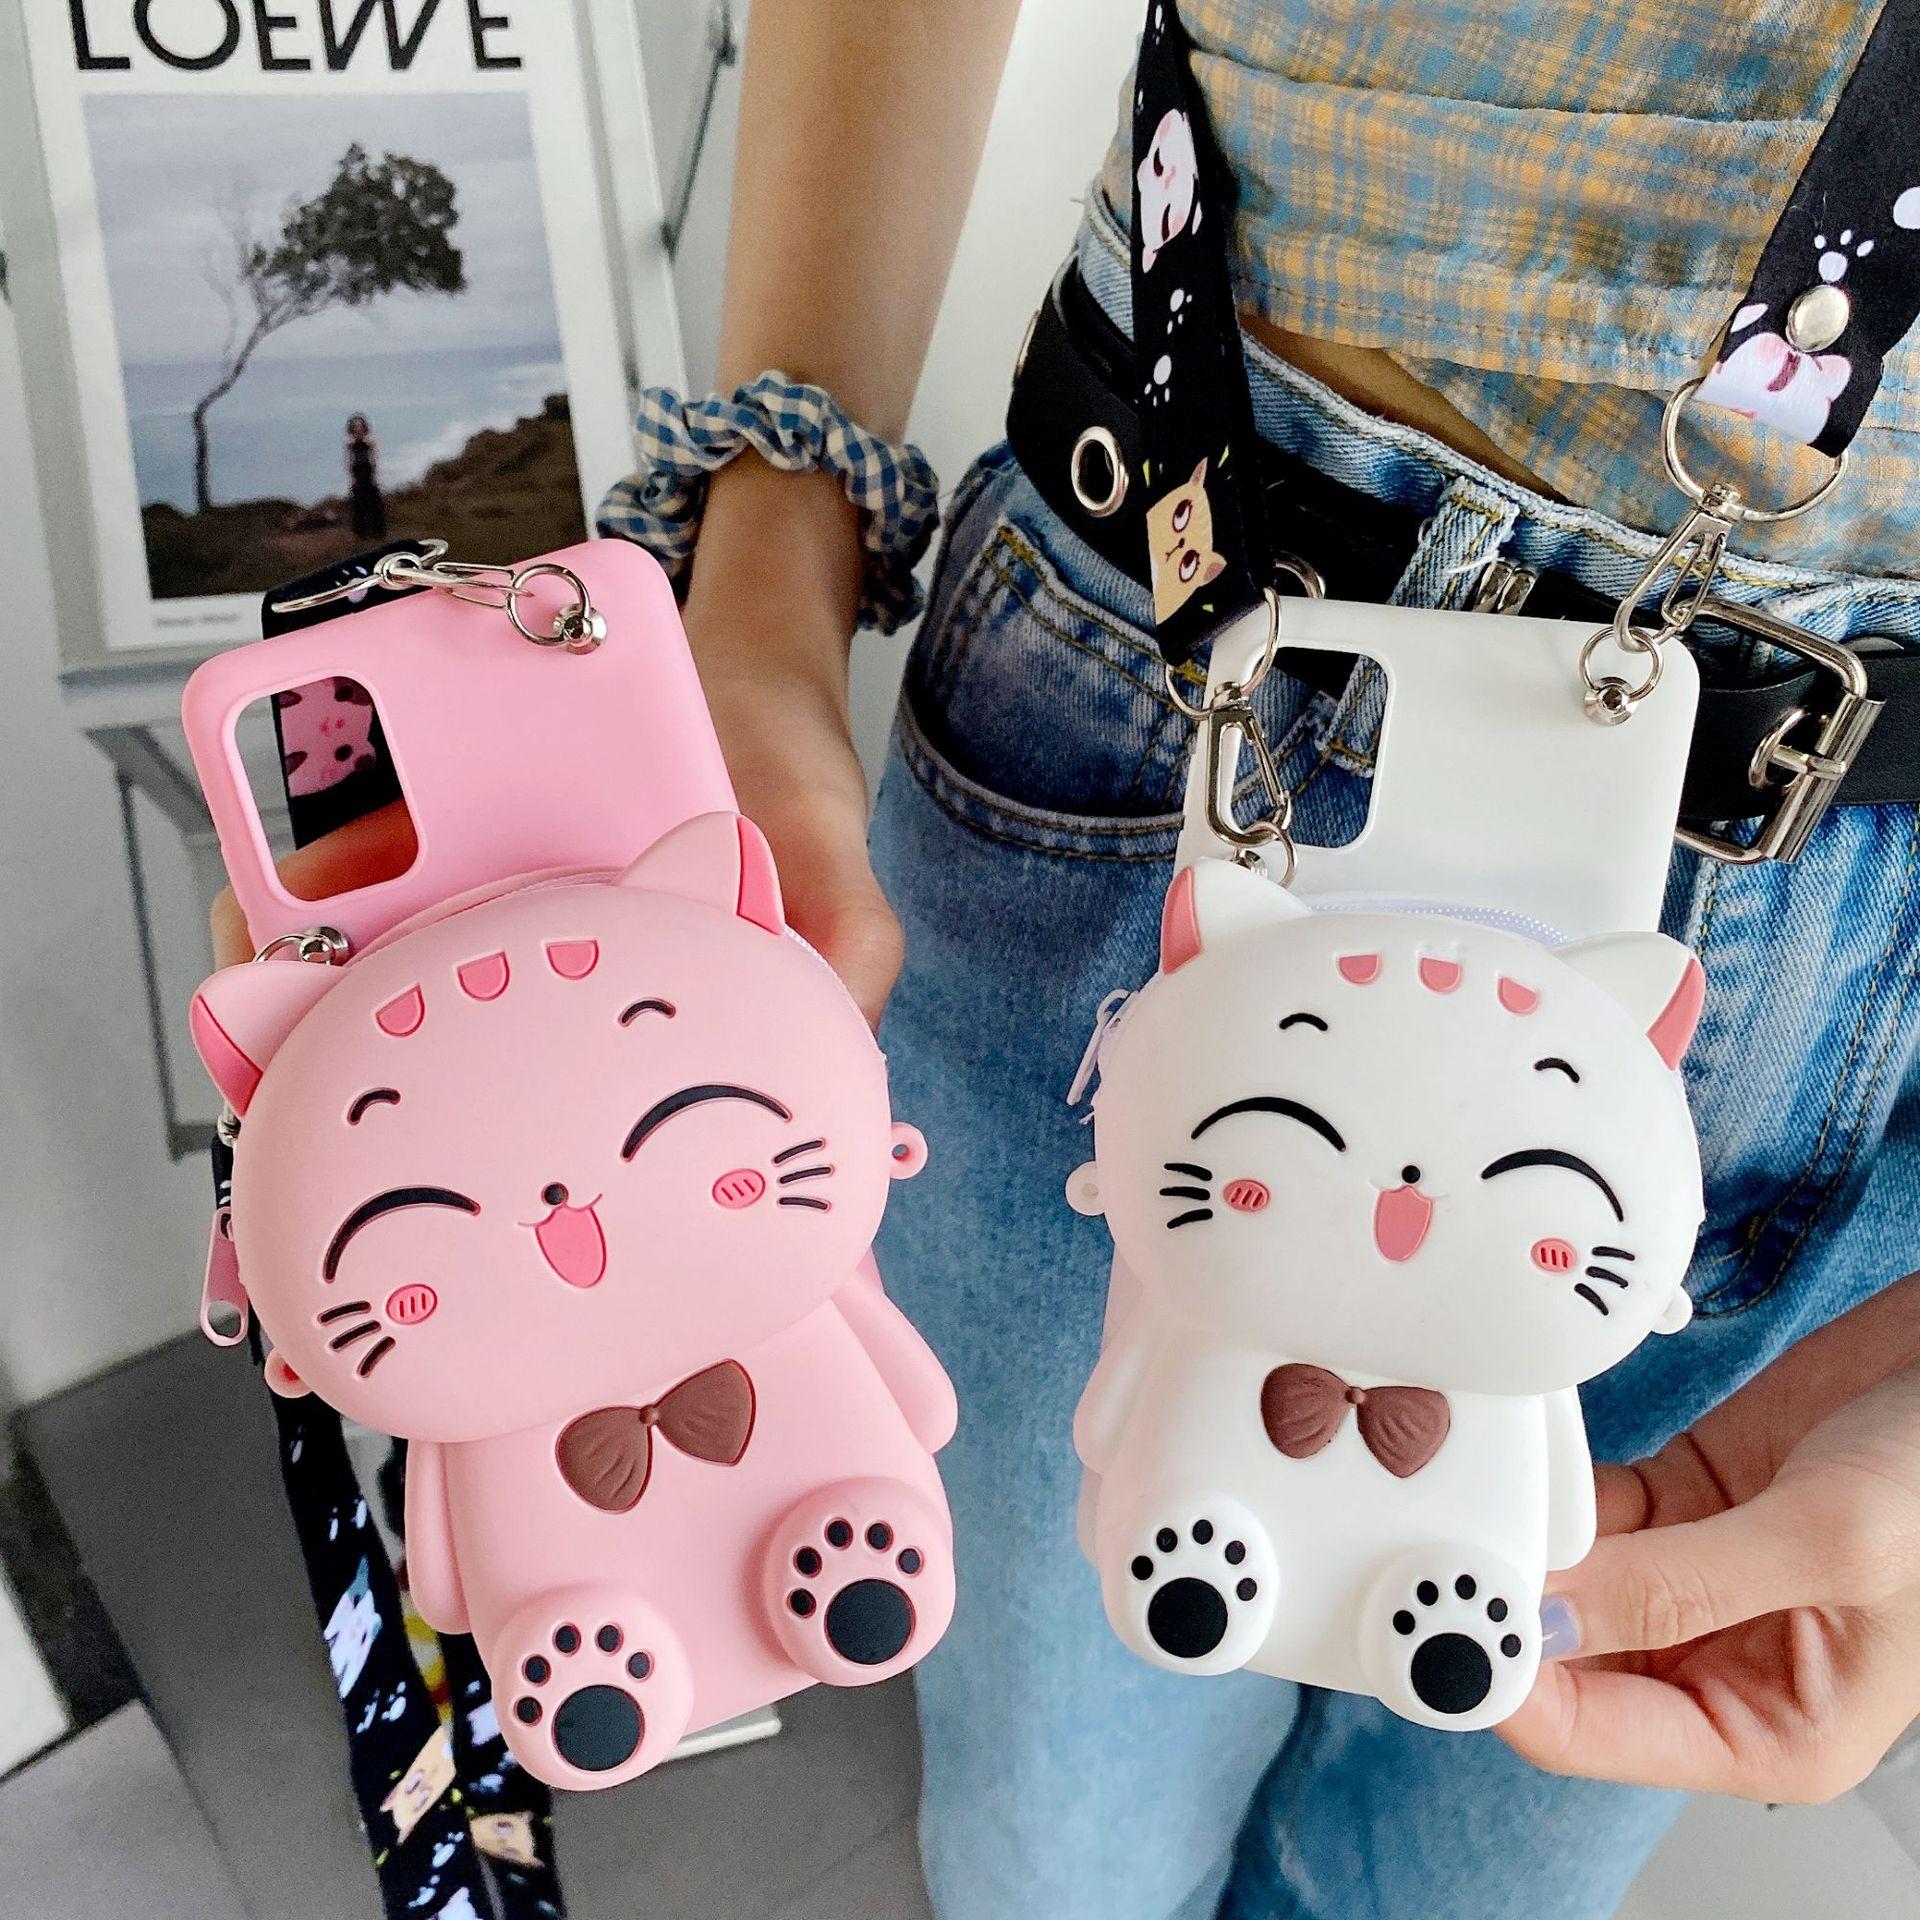 New 3D Cartoon Cat Wallet Bags Case For Xiaomi Pocophone F1 F2 F3 M2 M3 X2 X3 Redmi K20 K30 K40  Y2